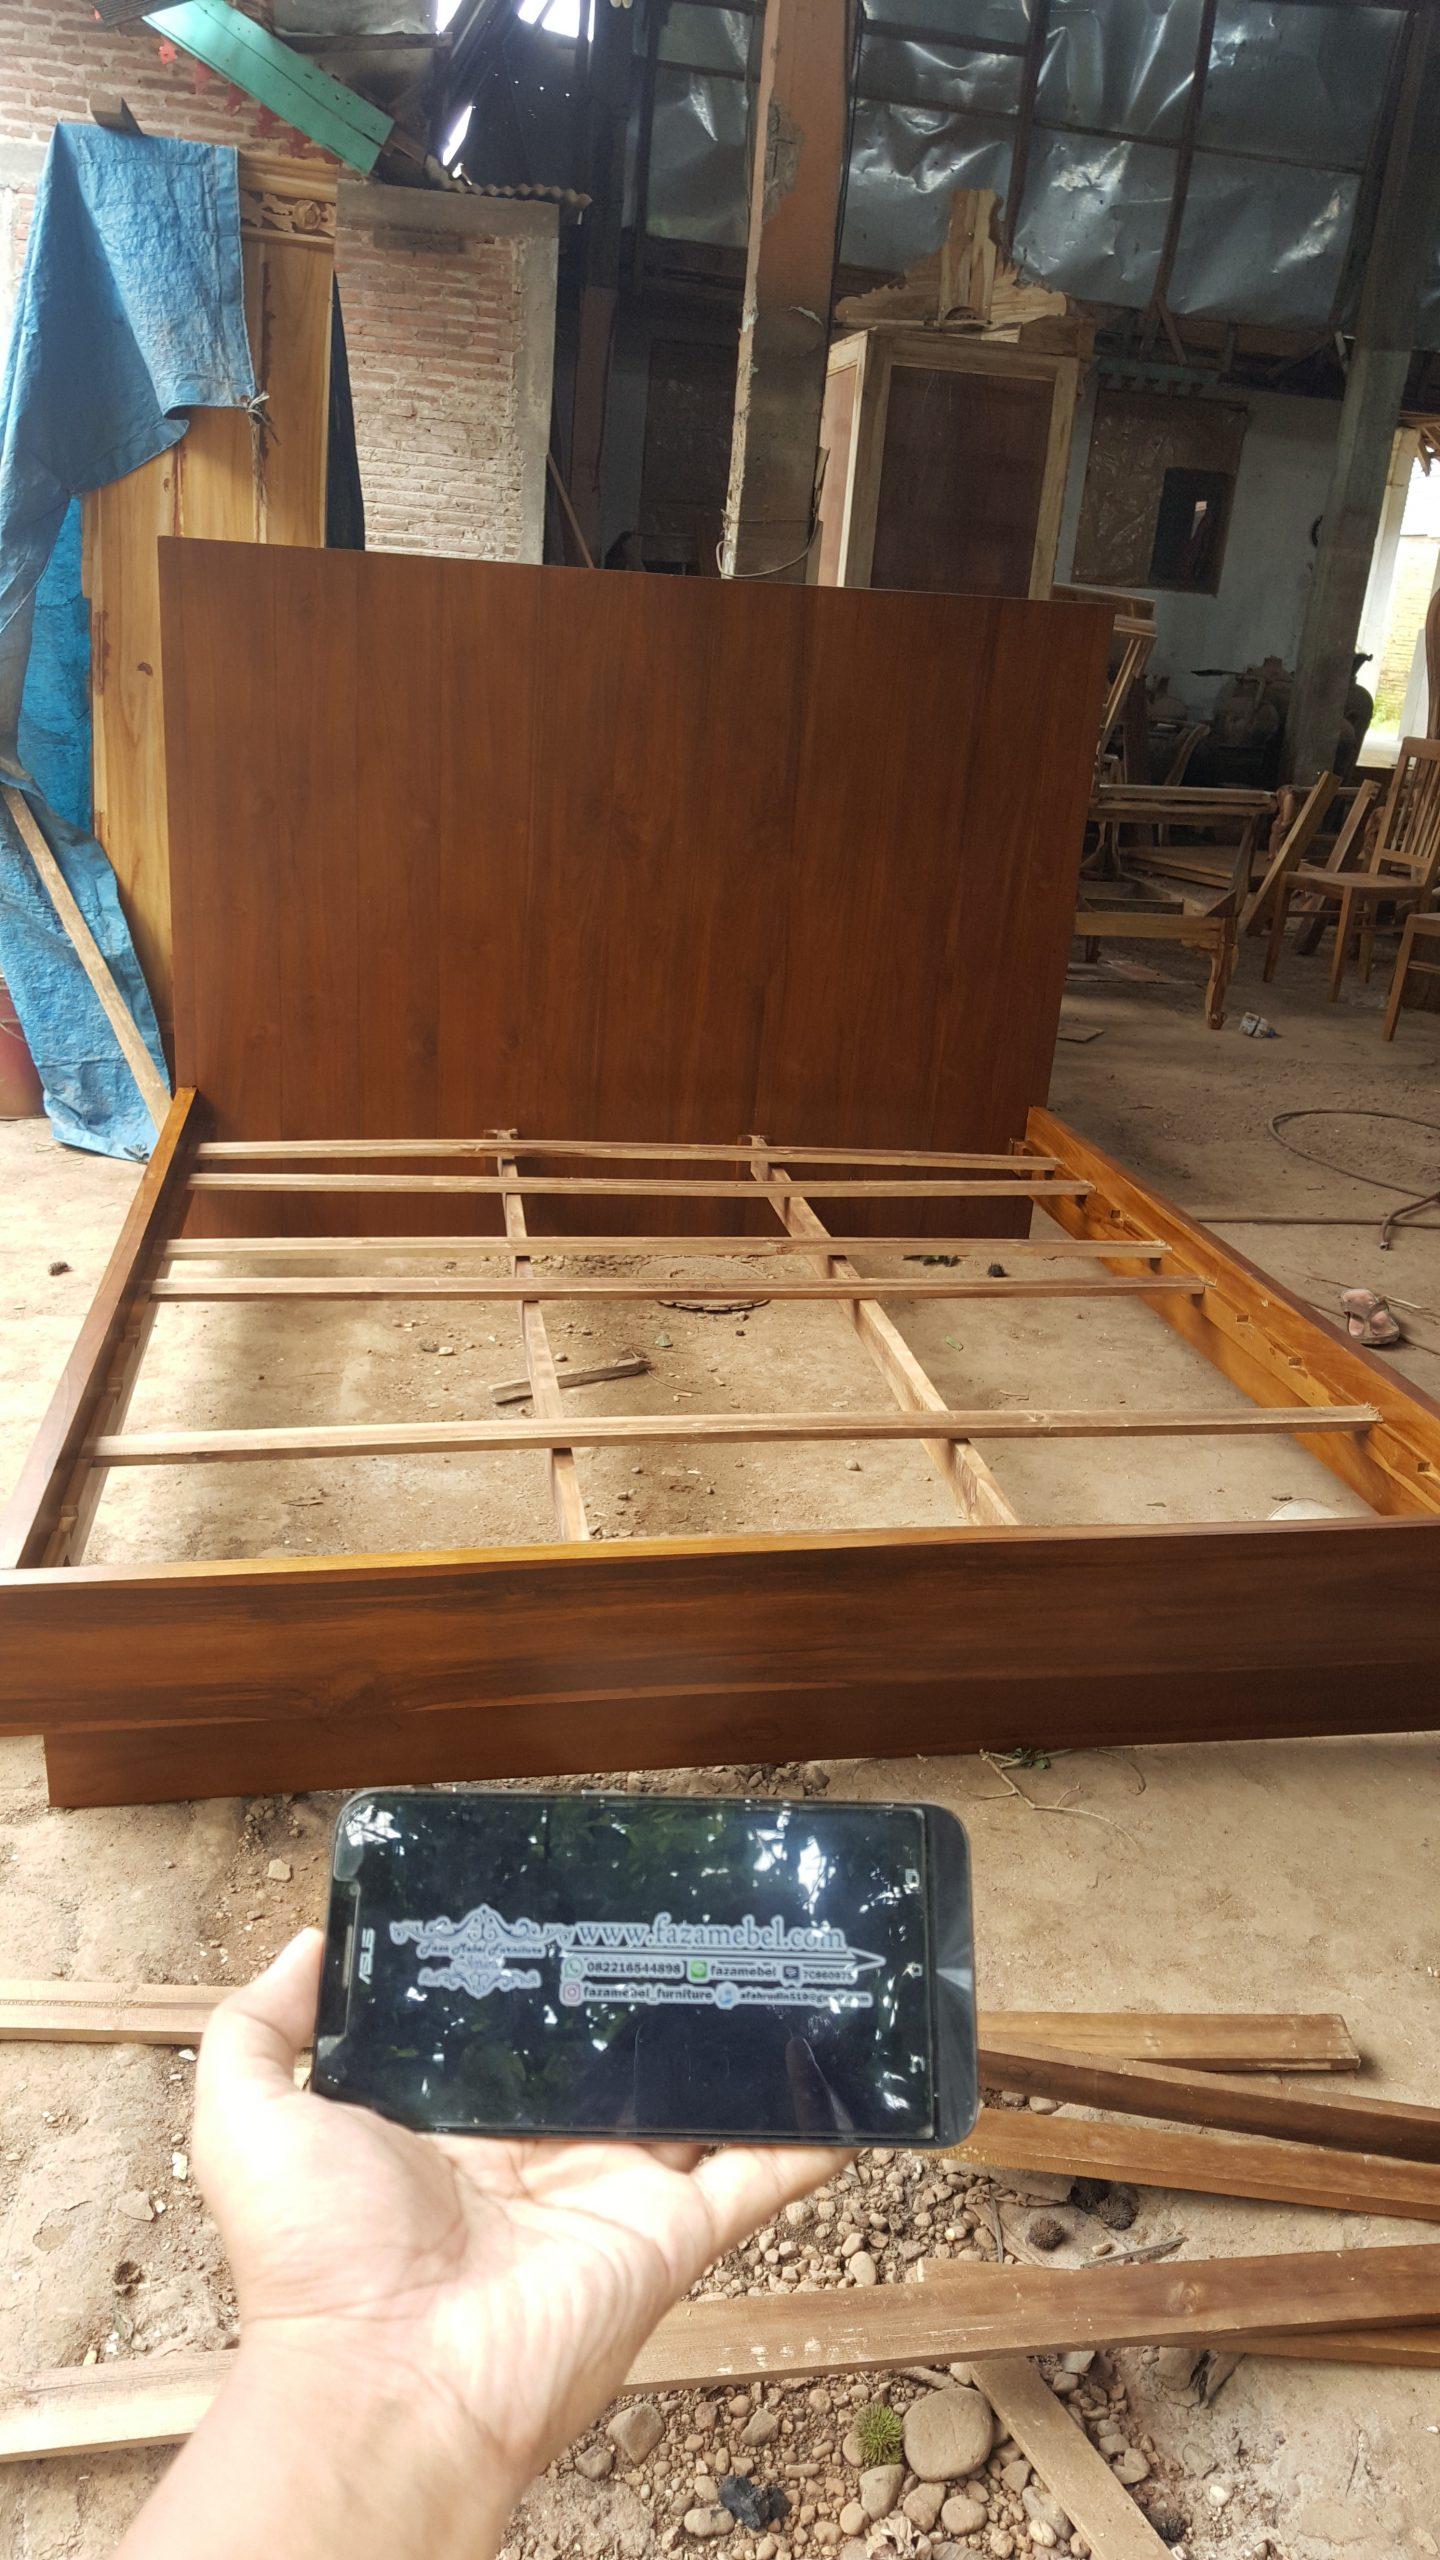 tempat-tidur-set-kayu-jati-mewah-ukir-jepara (17)